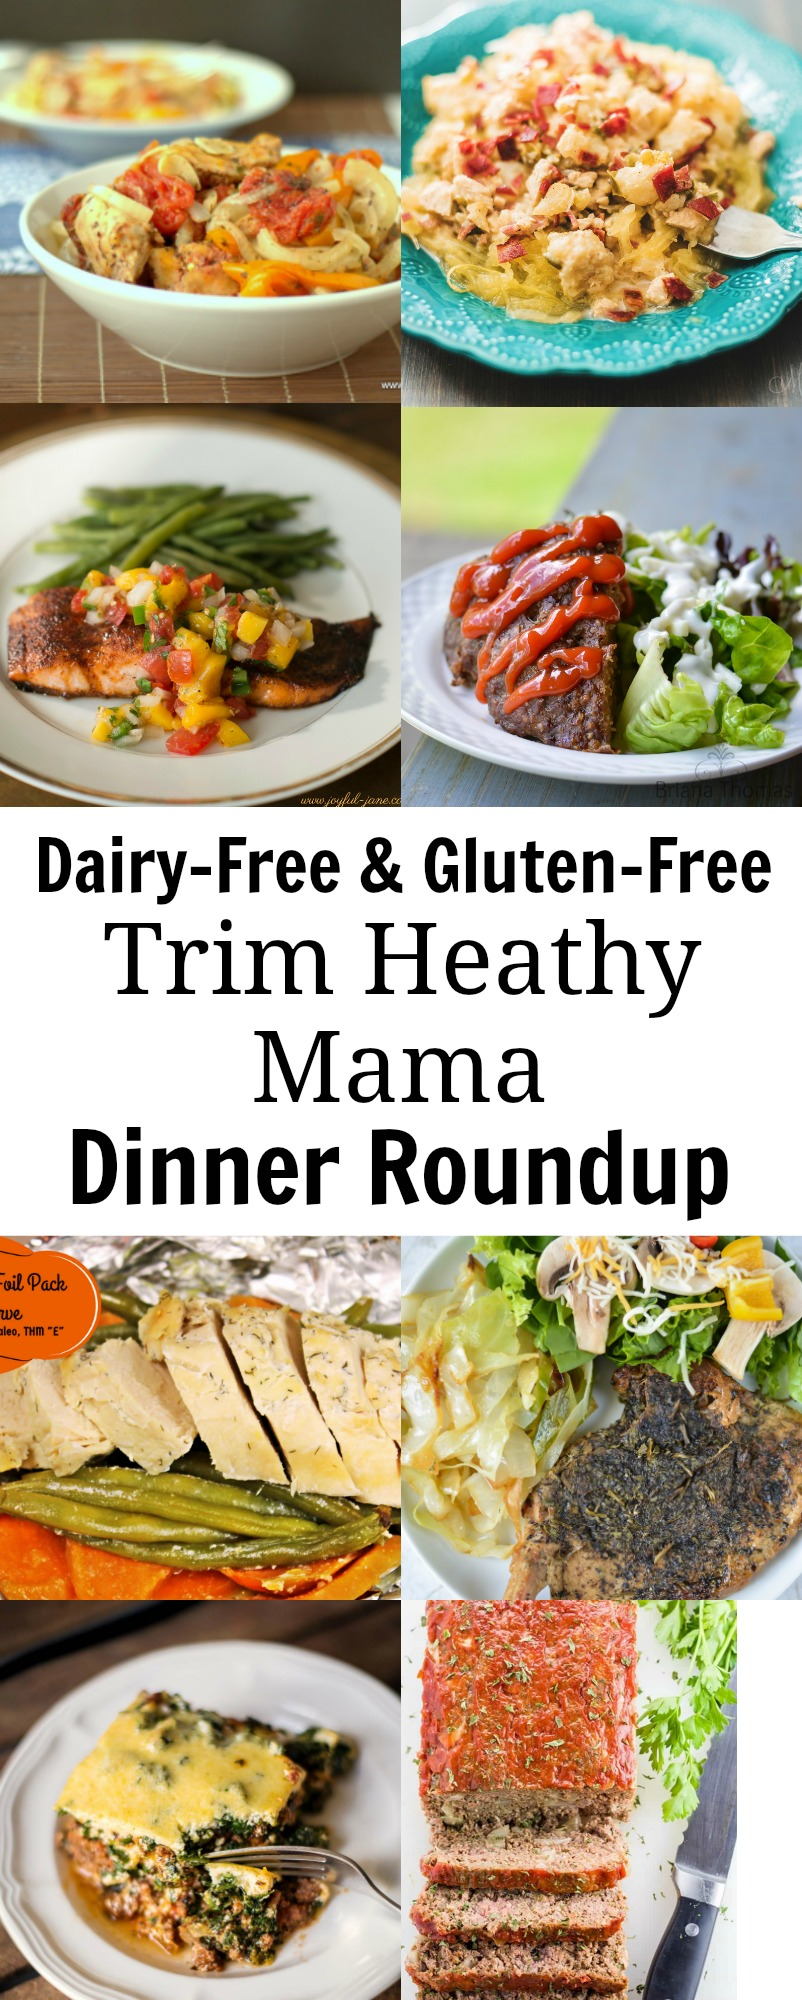 Dairy-Free Gluten-free THM Dinner Roundup